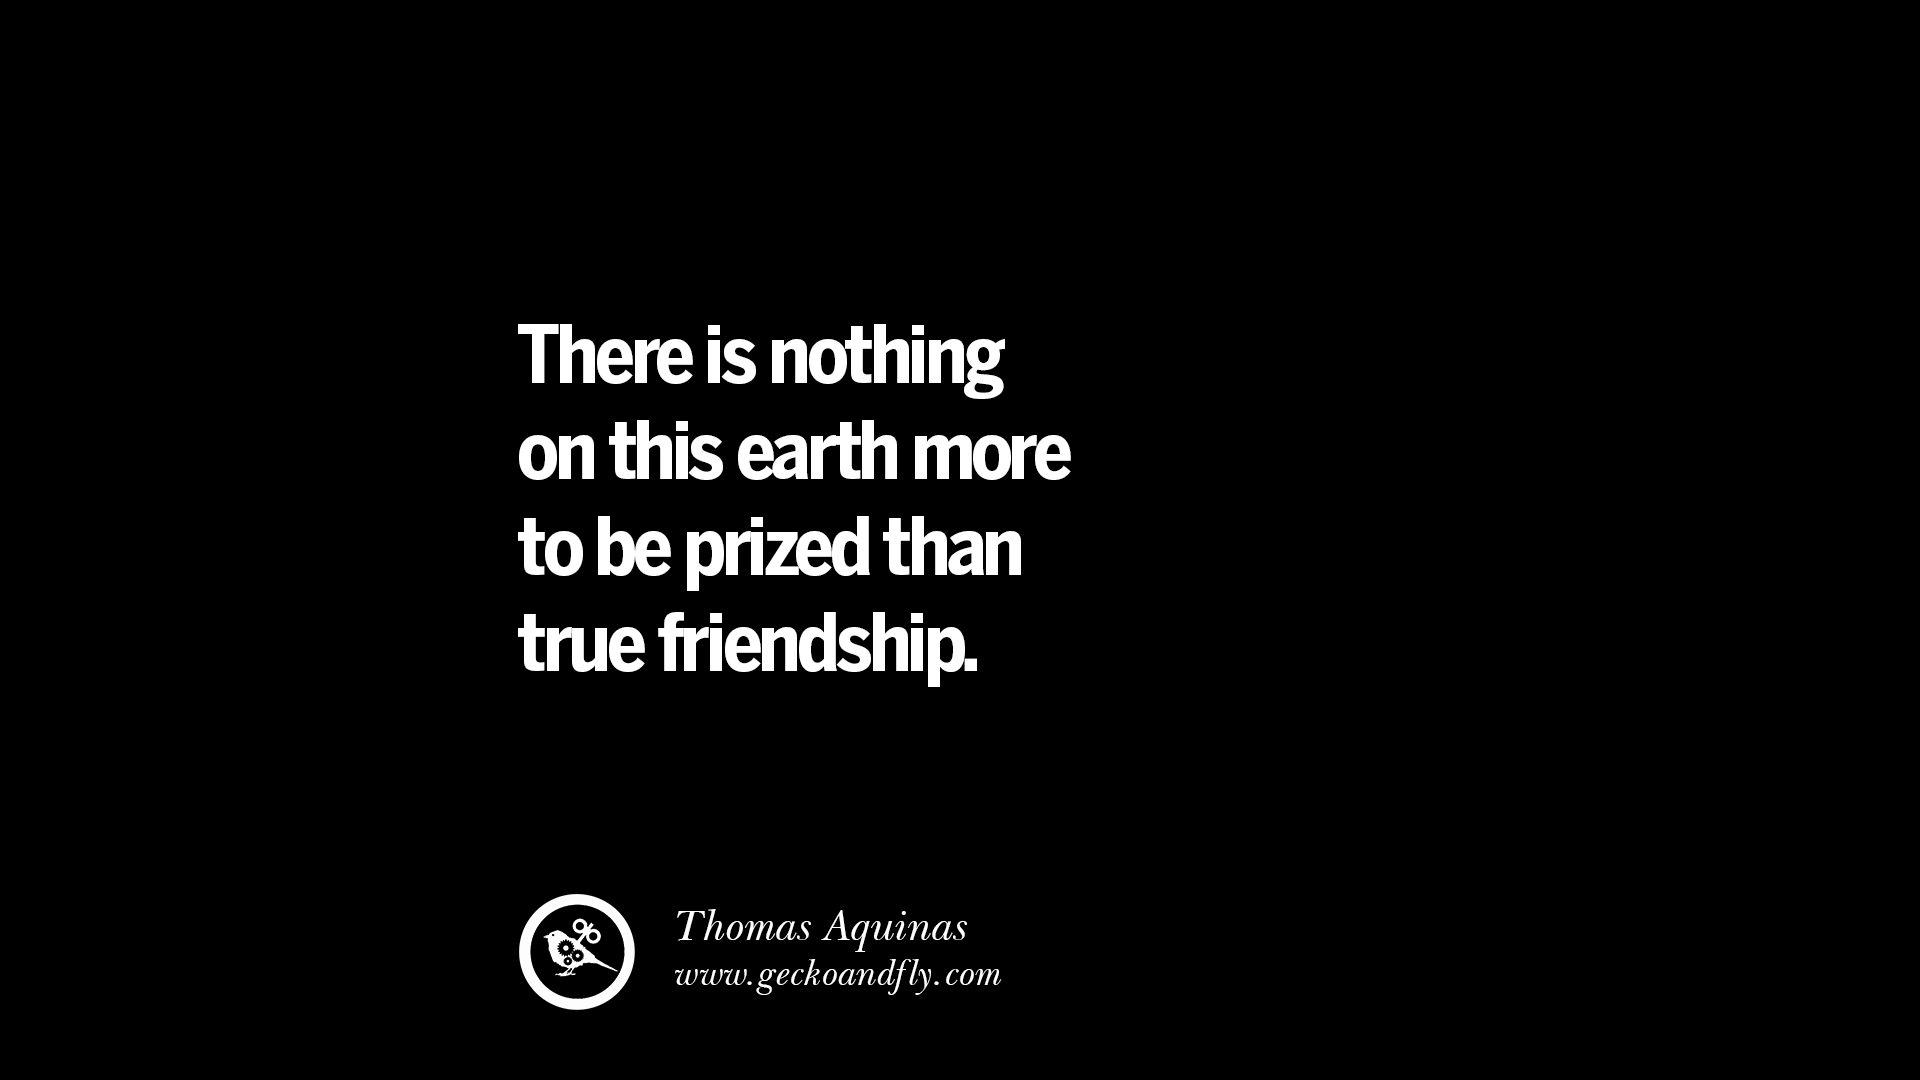 Teal Friends Love Hindi Love Sayings Friendship Quotes Friendship Quotes Quotes About Friendship Love inspiration Love And Friendship Quotes